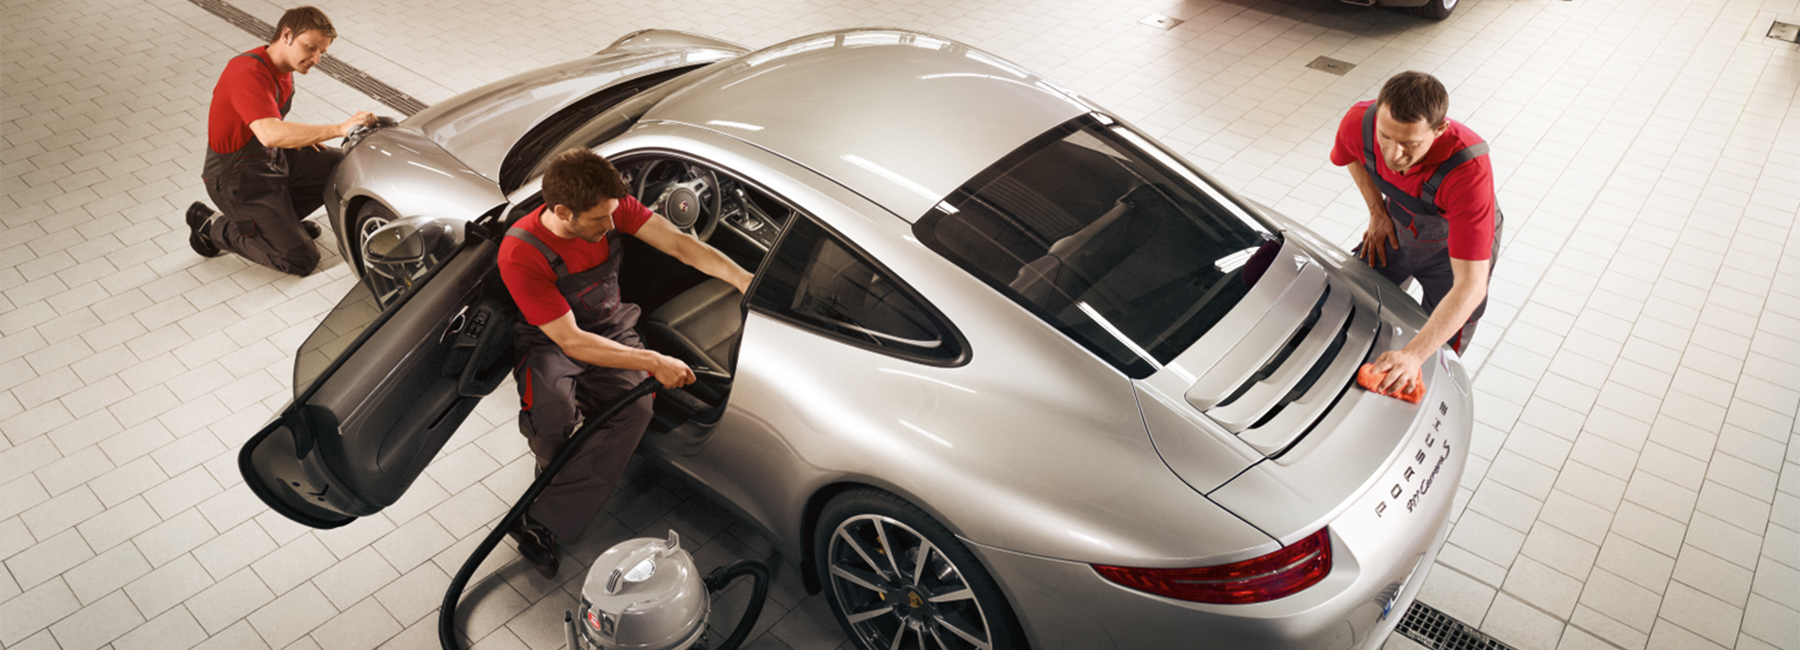 Porsche Service, Parts, and Accessories